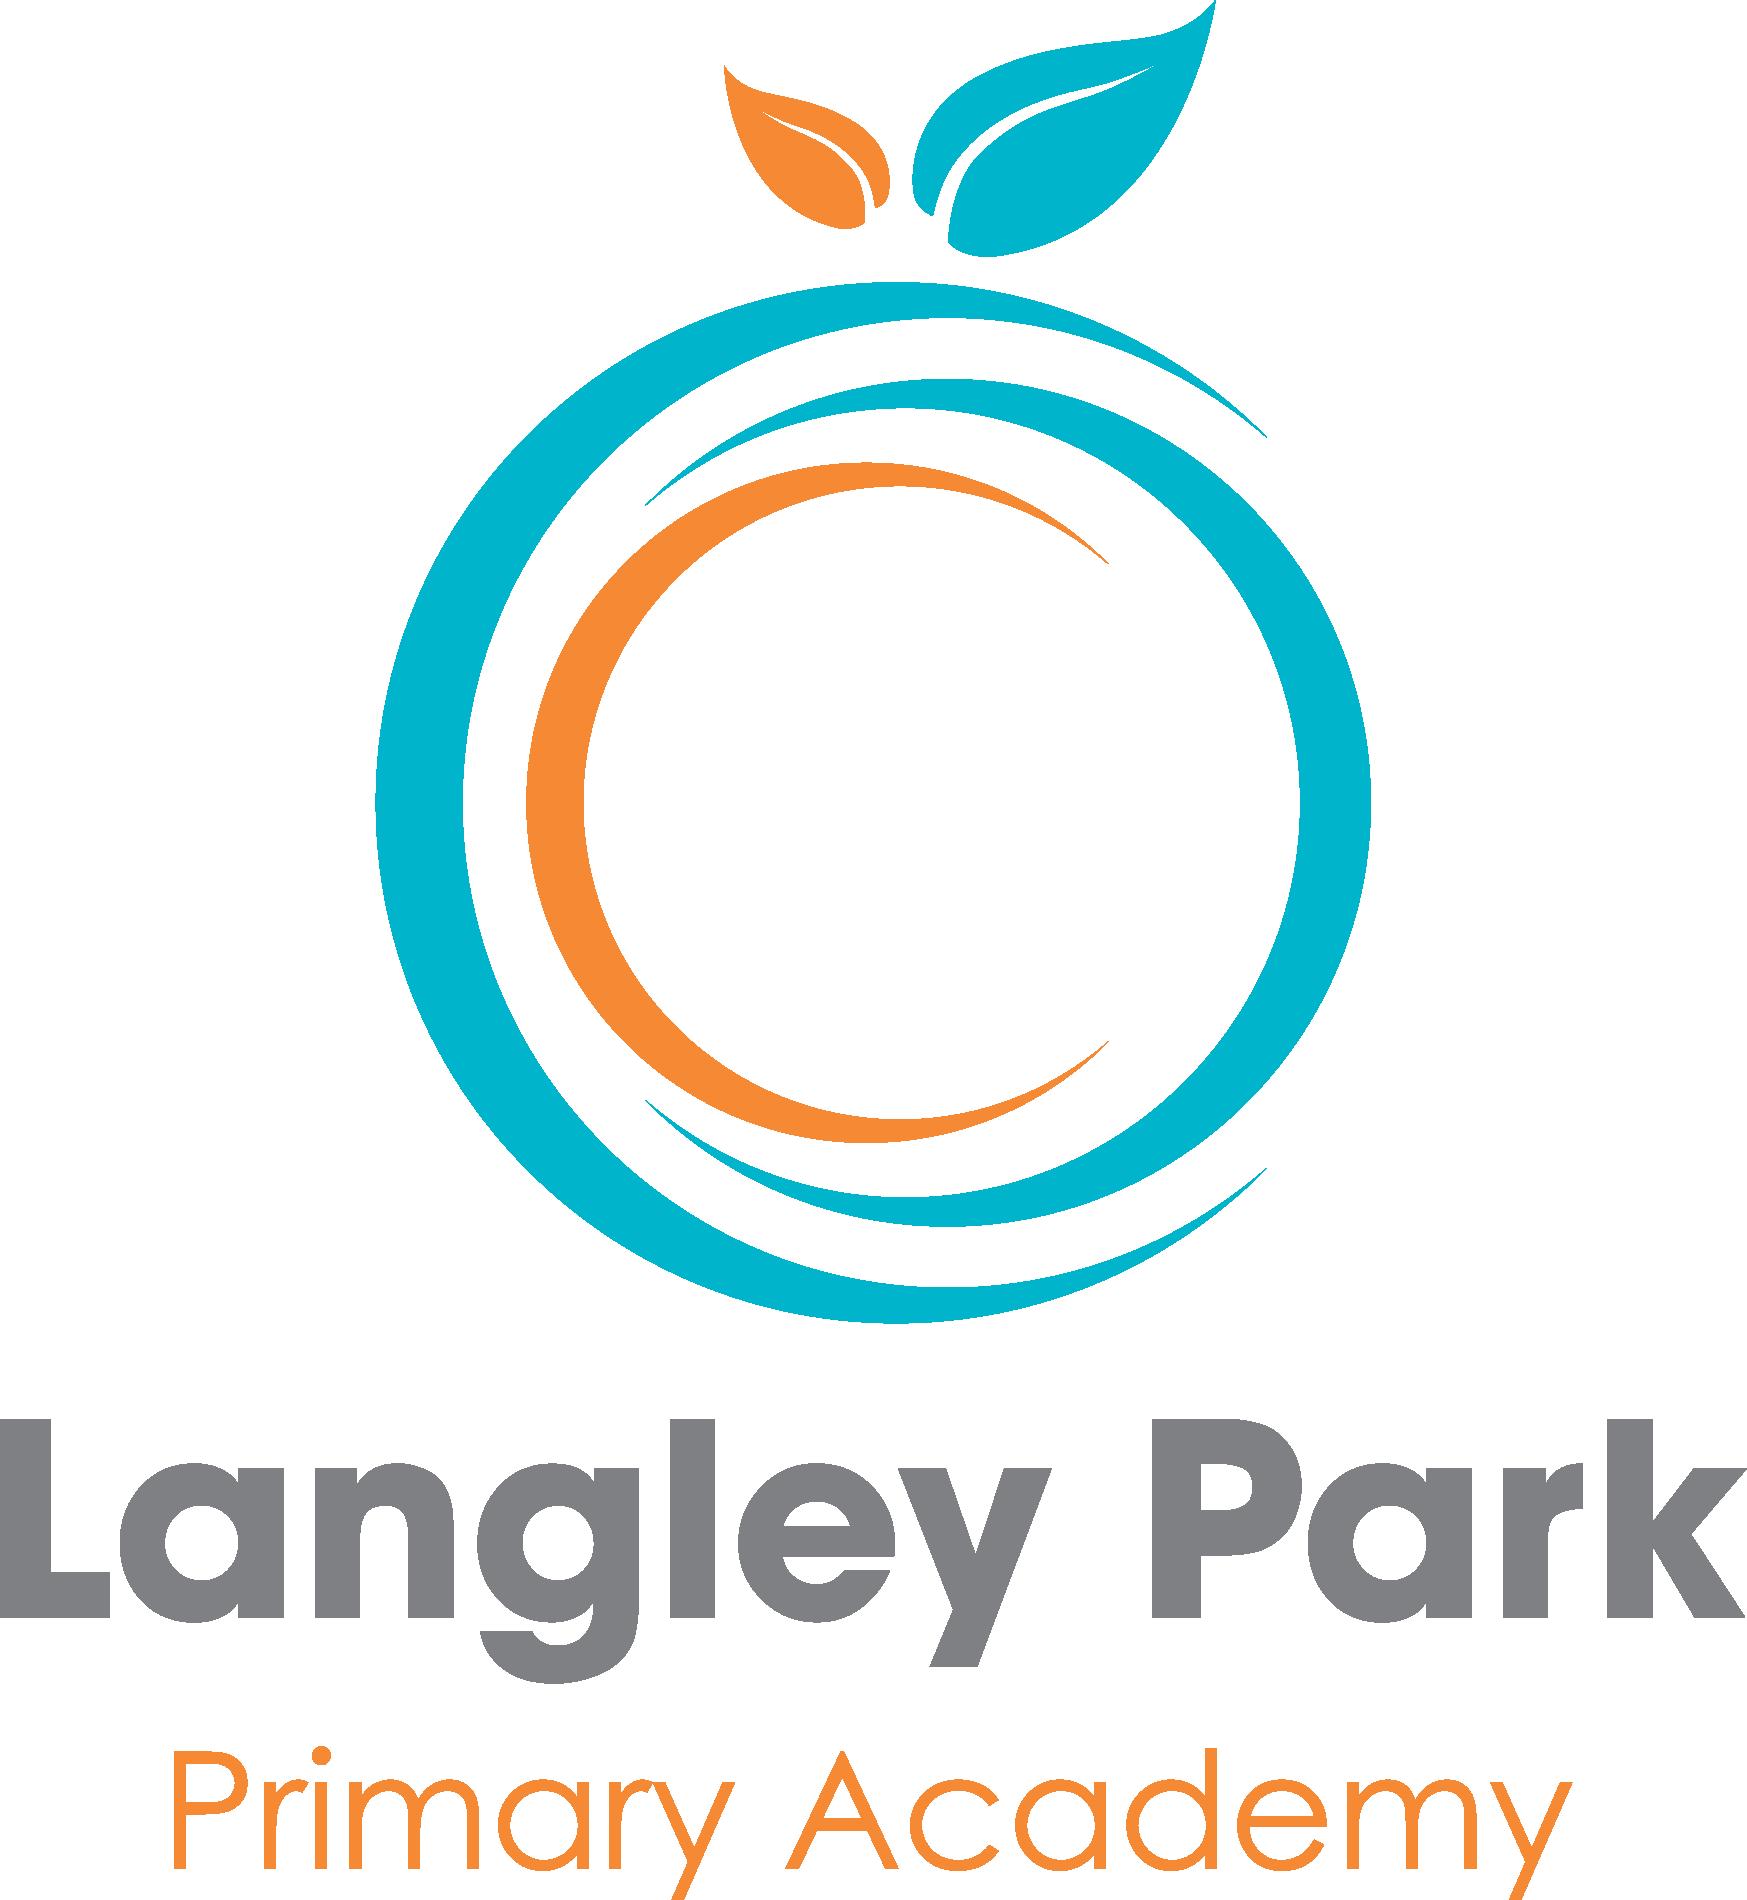 Langley Park Primary Academy